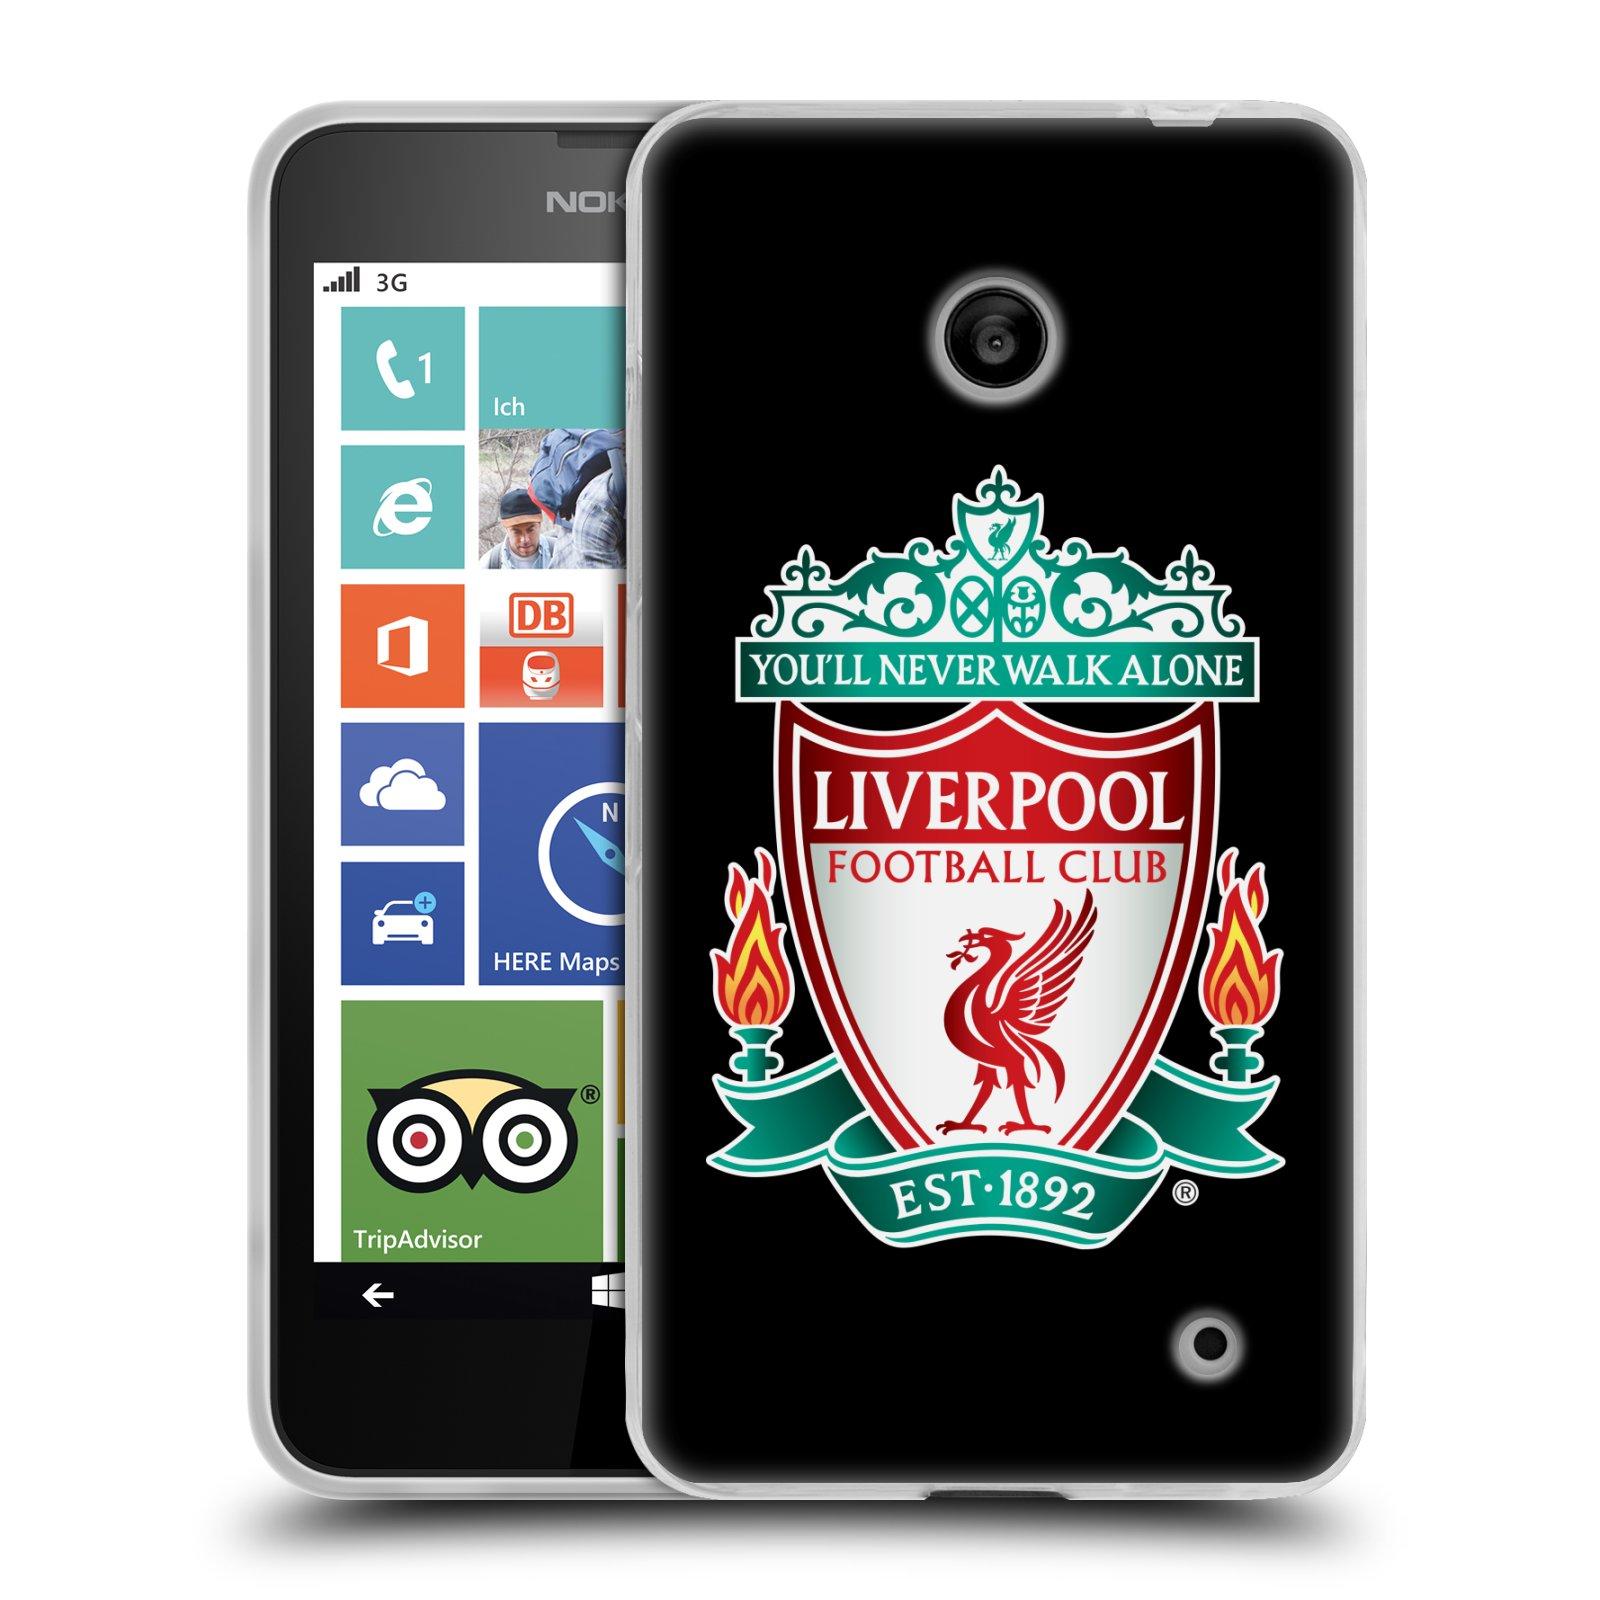 Silikonové pouzdro na mobil Nokia Lumia 630 HEAD CASE ZNAK LIVERPOOL FC OFFICIAL BLACK (Silikonový kryt či obal na mobilní telefon Liverpool FC Official pro Nokia Lumia 630 a Nokia Lumia 630 Dual SIM)